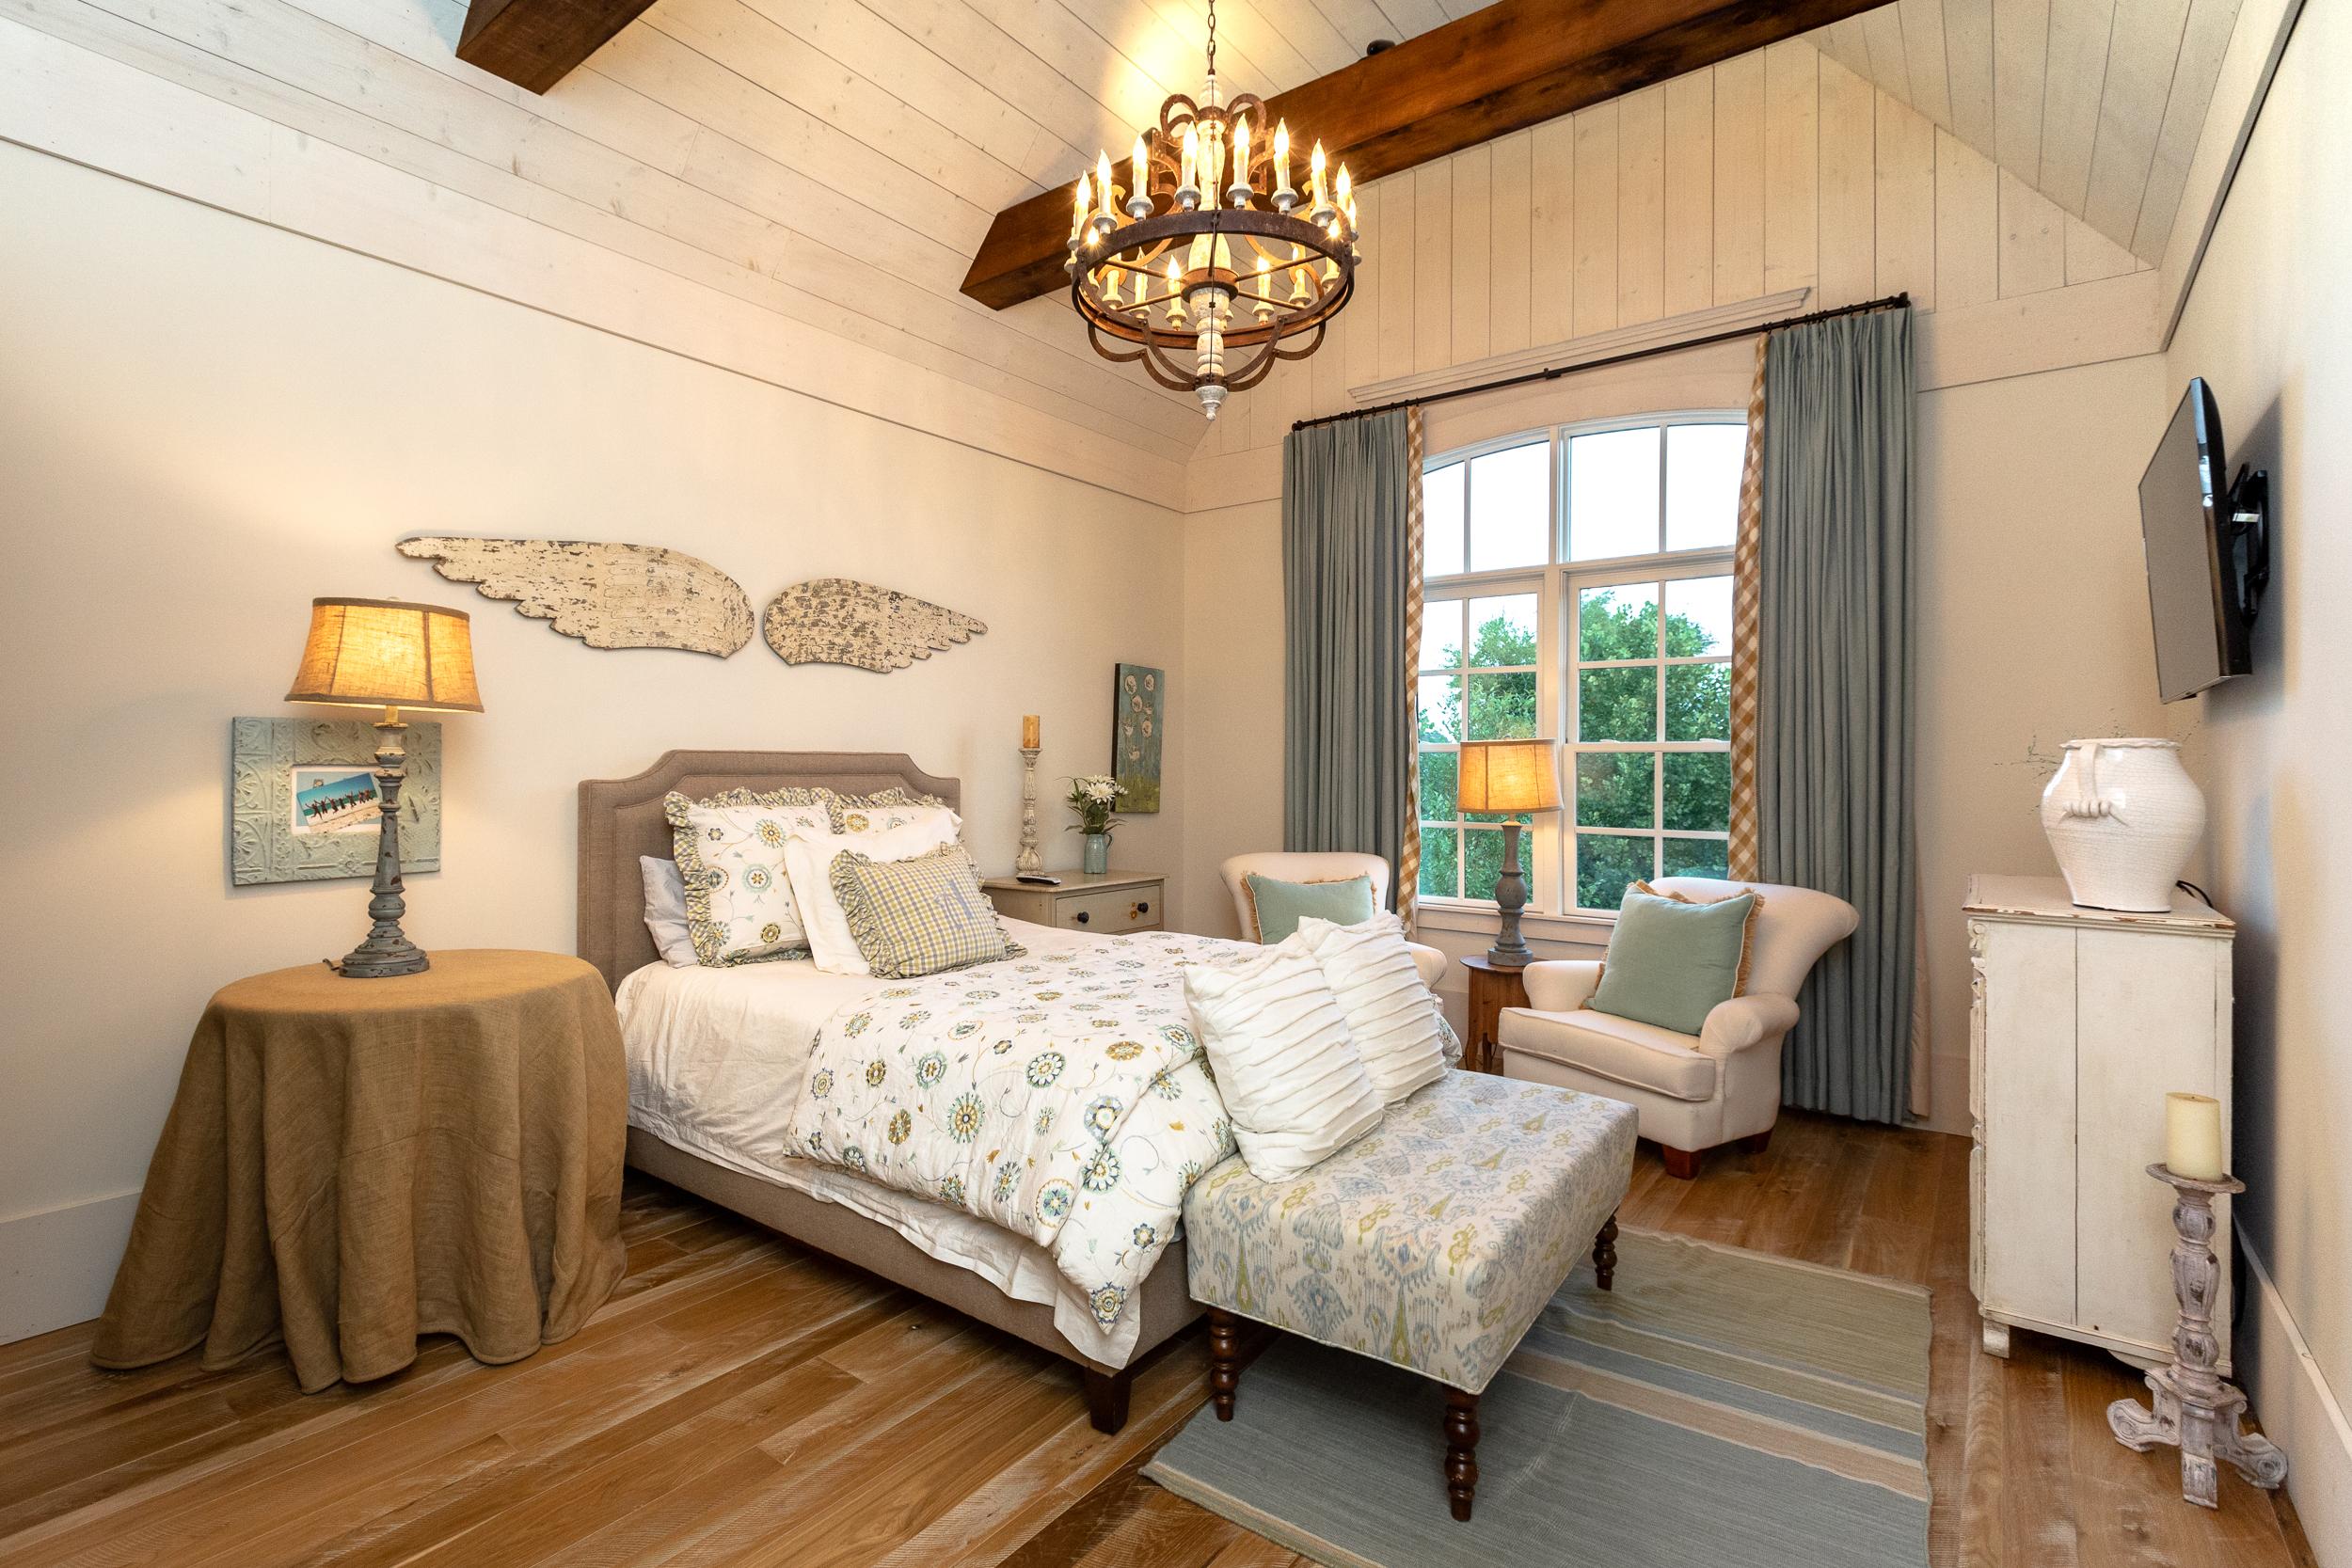 domophotos high standard real estate photography - Nashville, TN bedroom